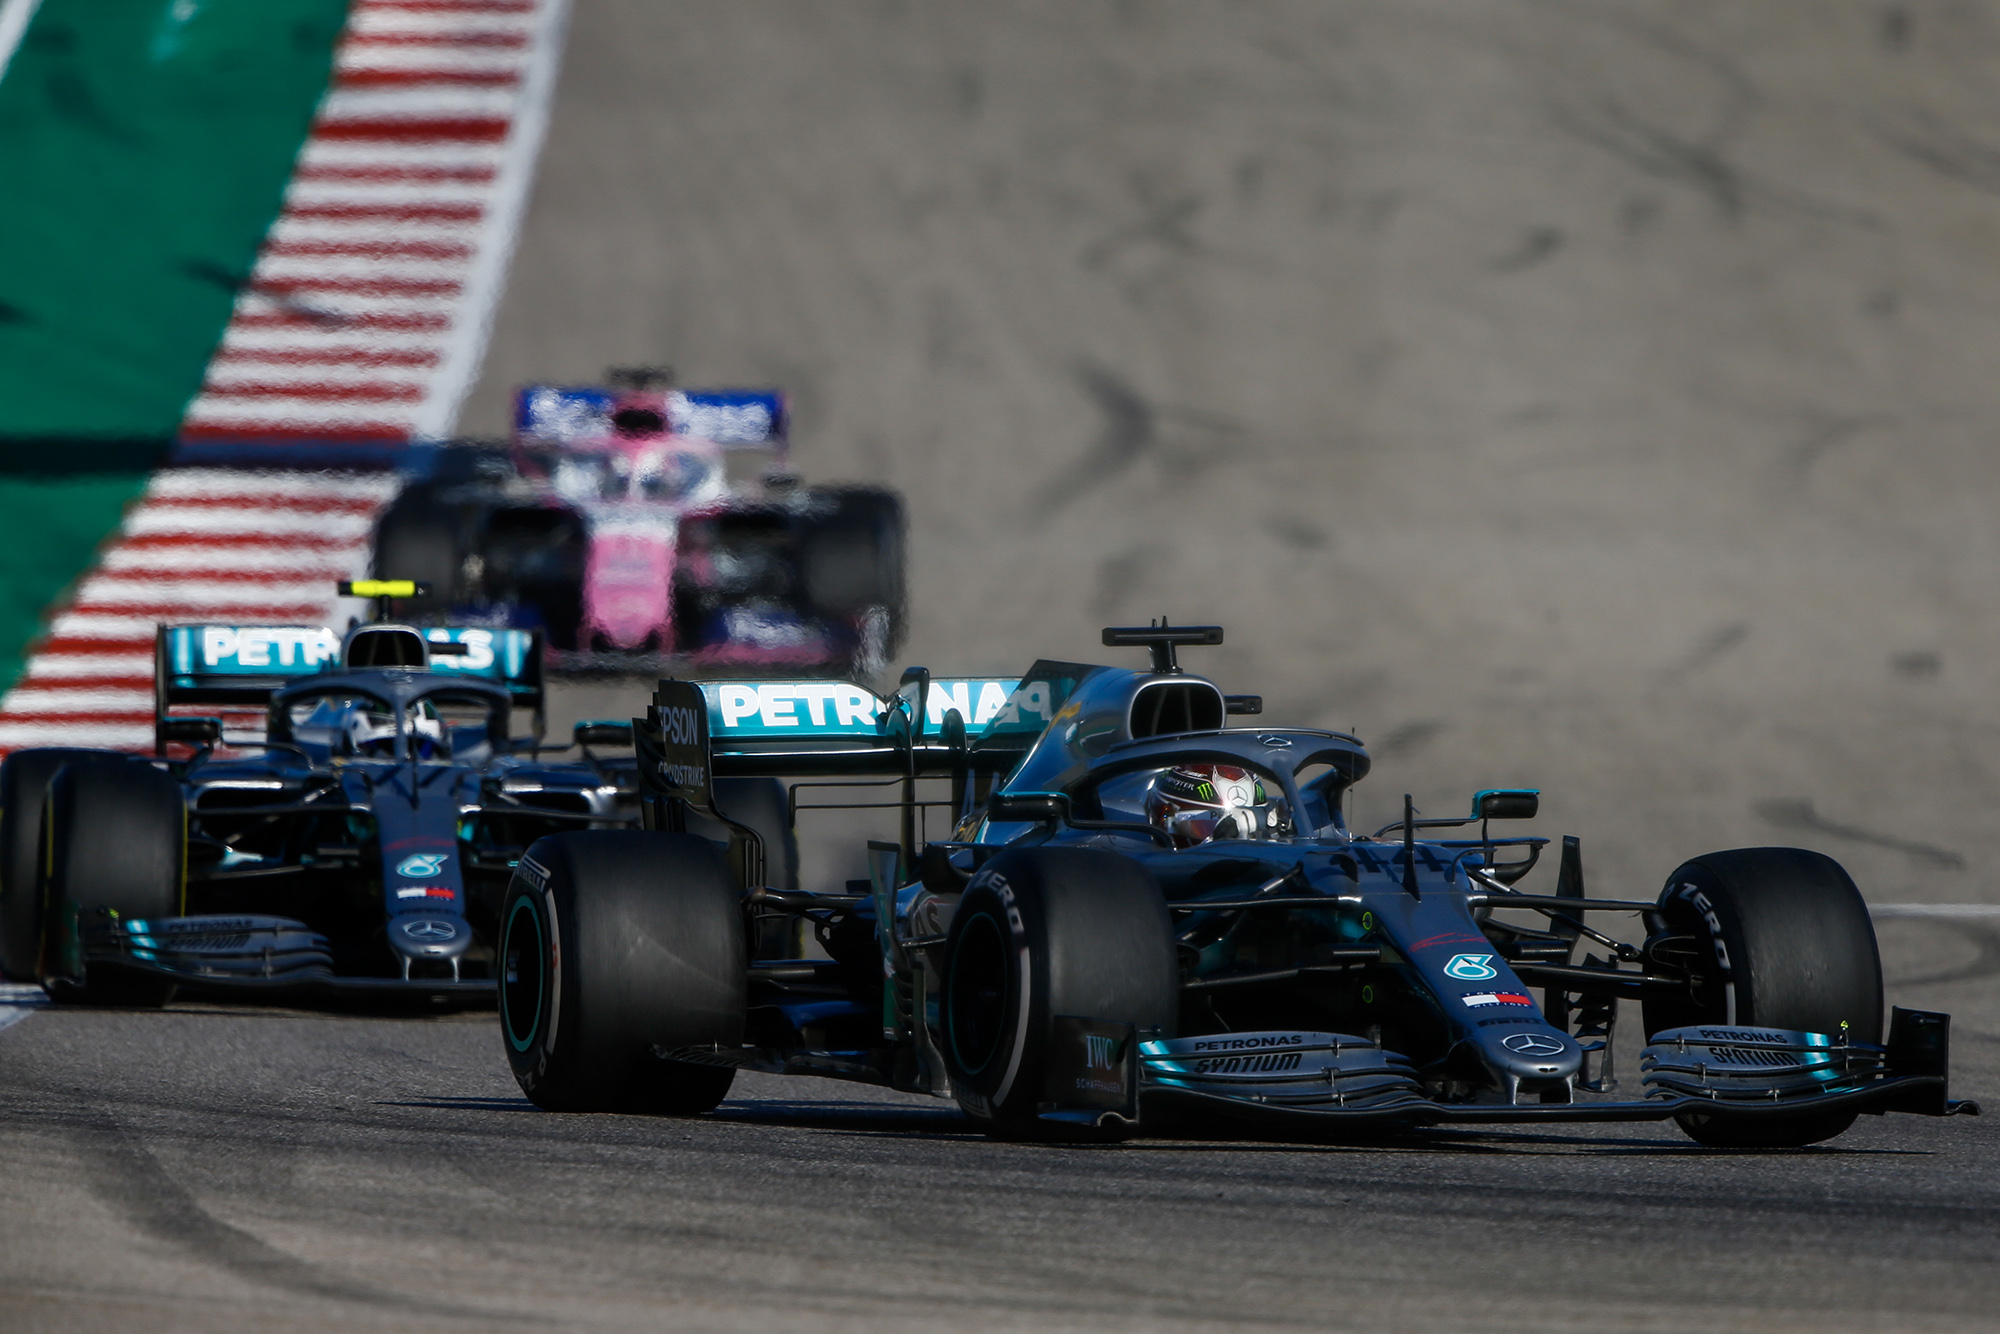 Valtteri Bottas follows closely behind Lewis Hamilton during the 2019 US Grand Prix